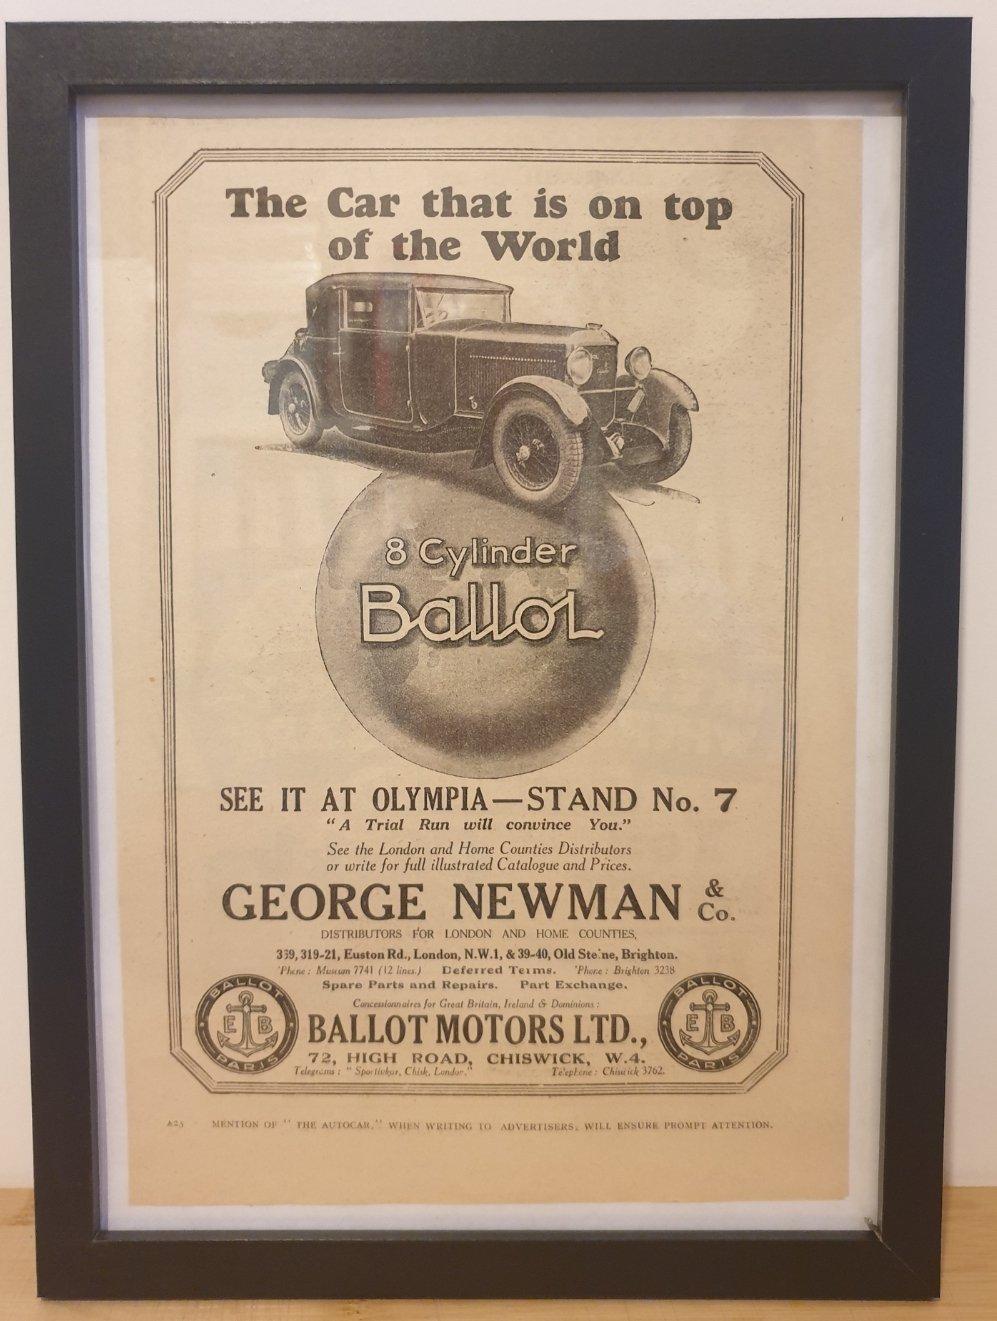 Picture of 1983 Original 1928 Ballot Motors Framed Advert